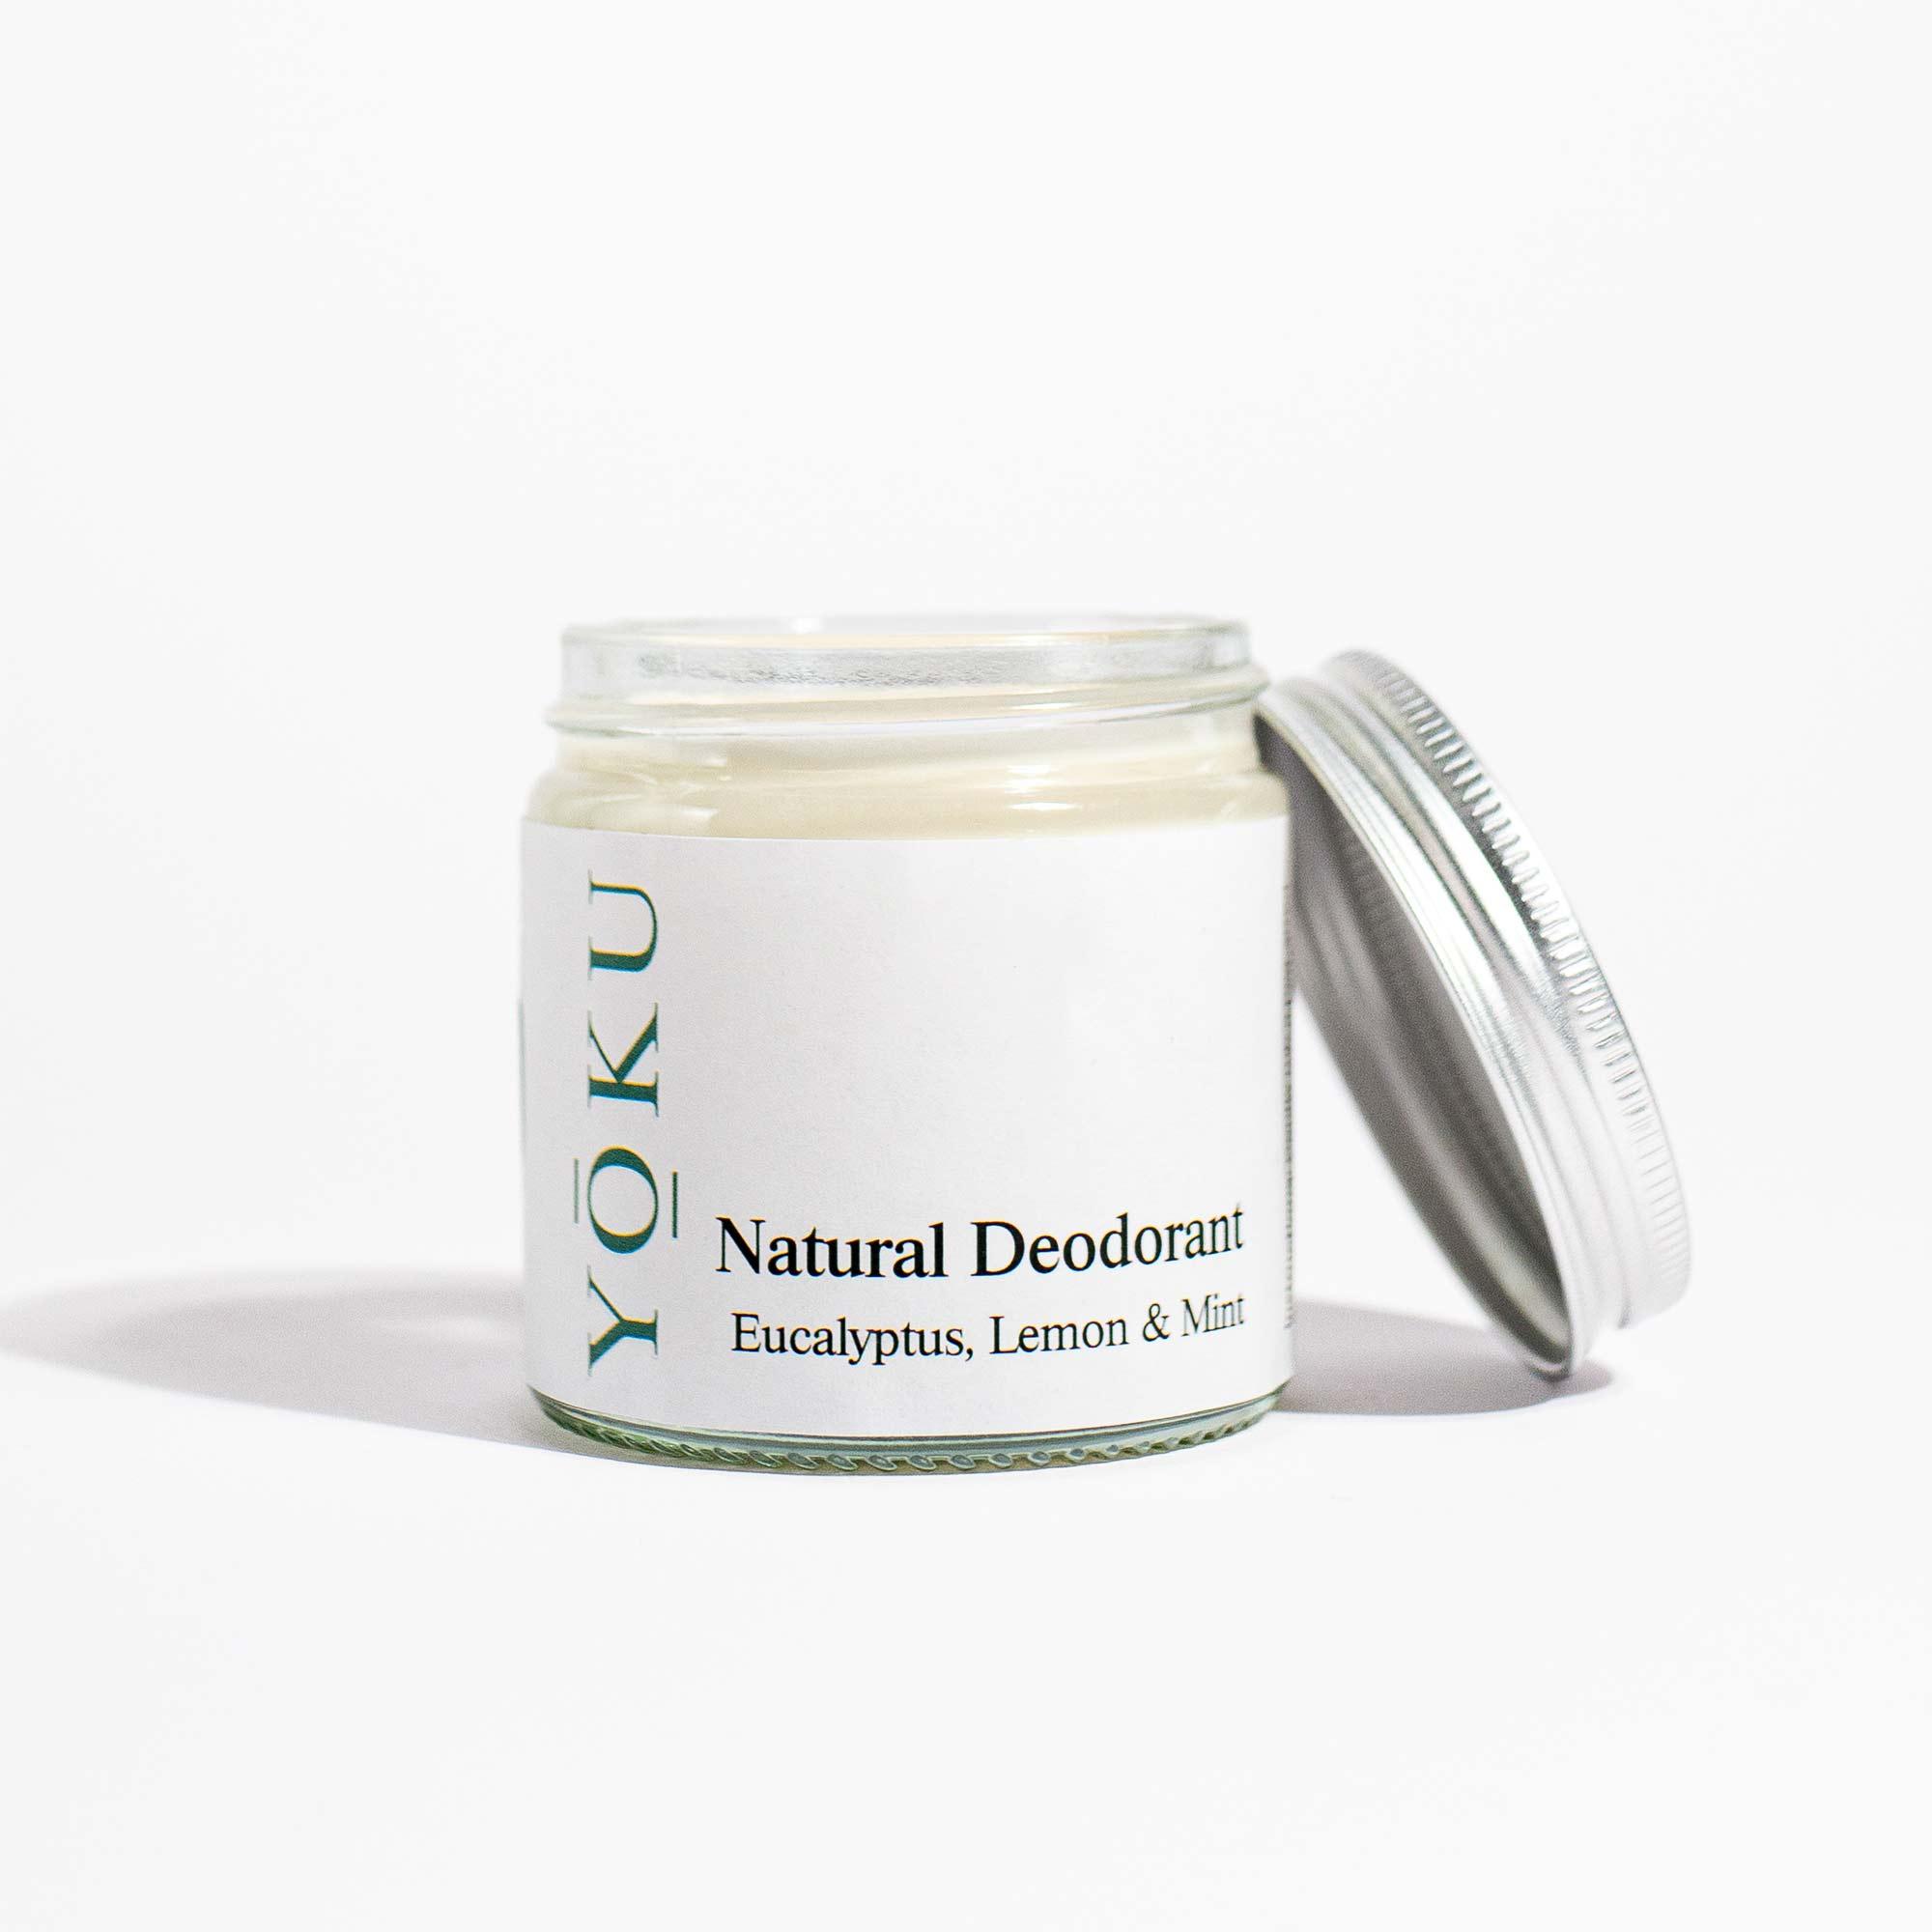 YOKU Natural Deodorants - Eucalyptus, Lemon & Mint 1